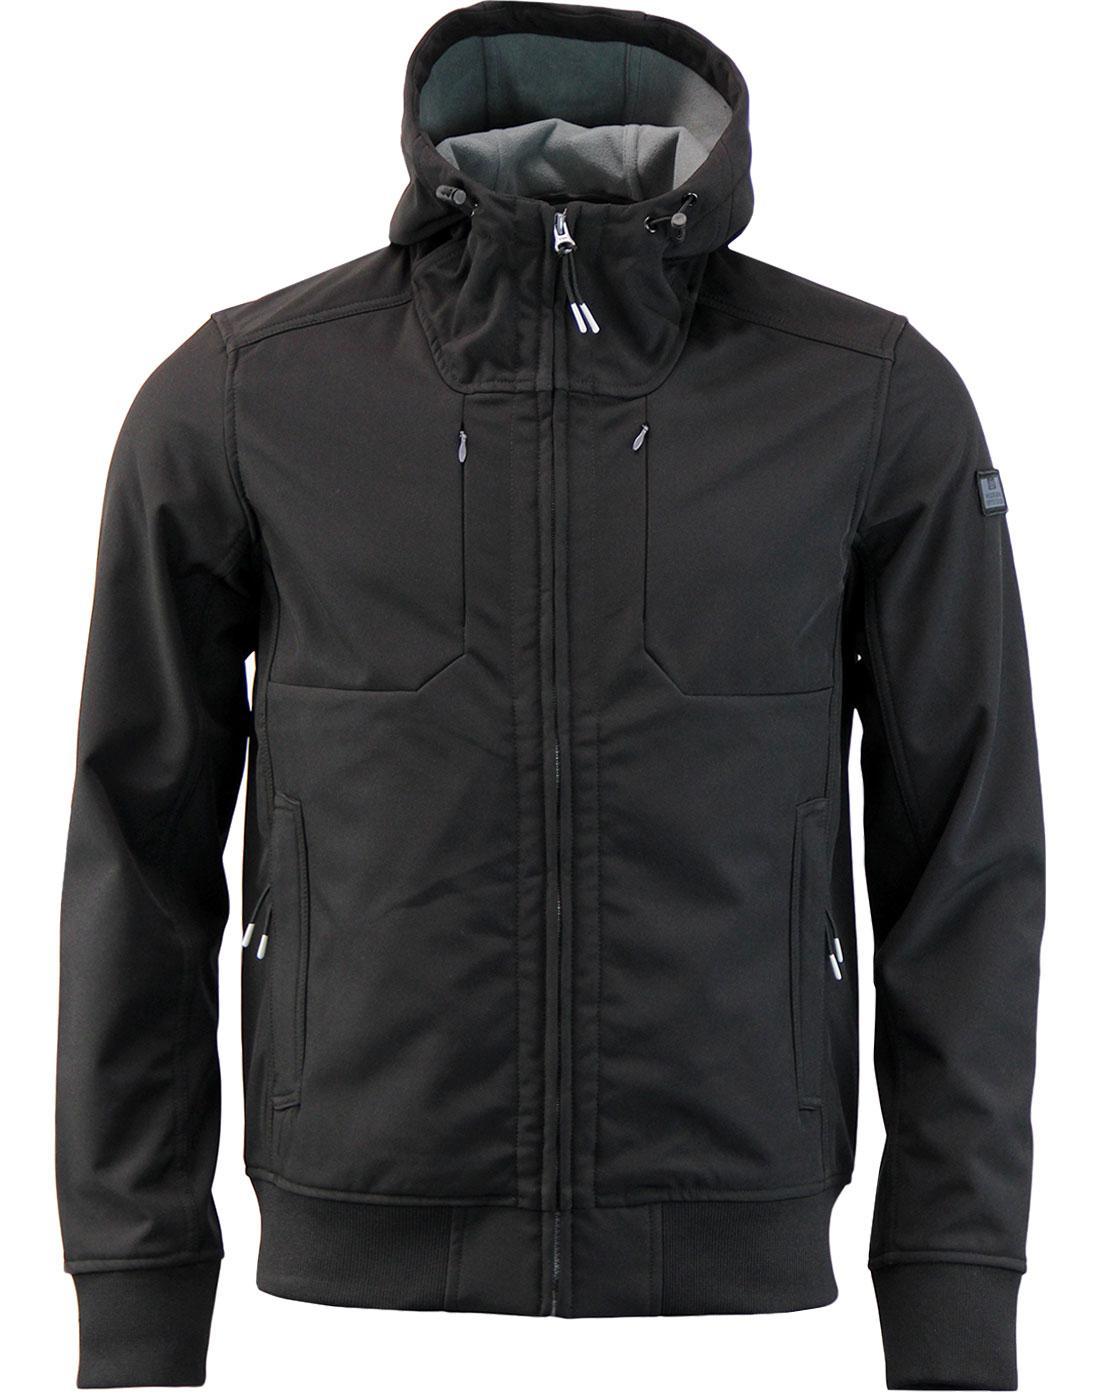 Irons WEEKEND OFFENDER Retro Fleece Lined Jacket